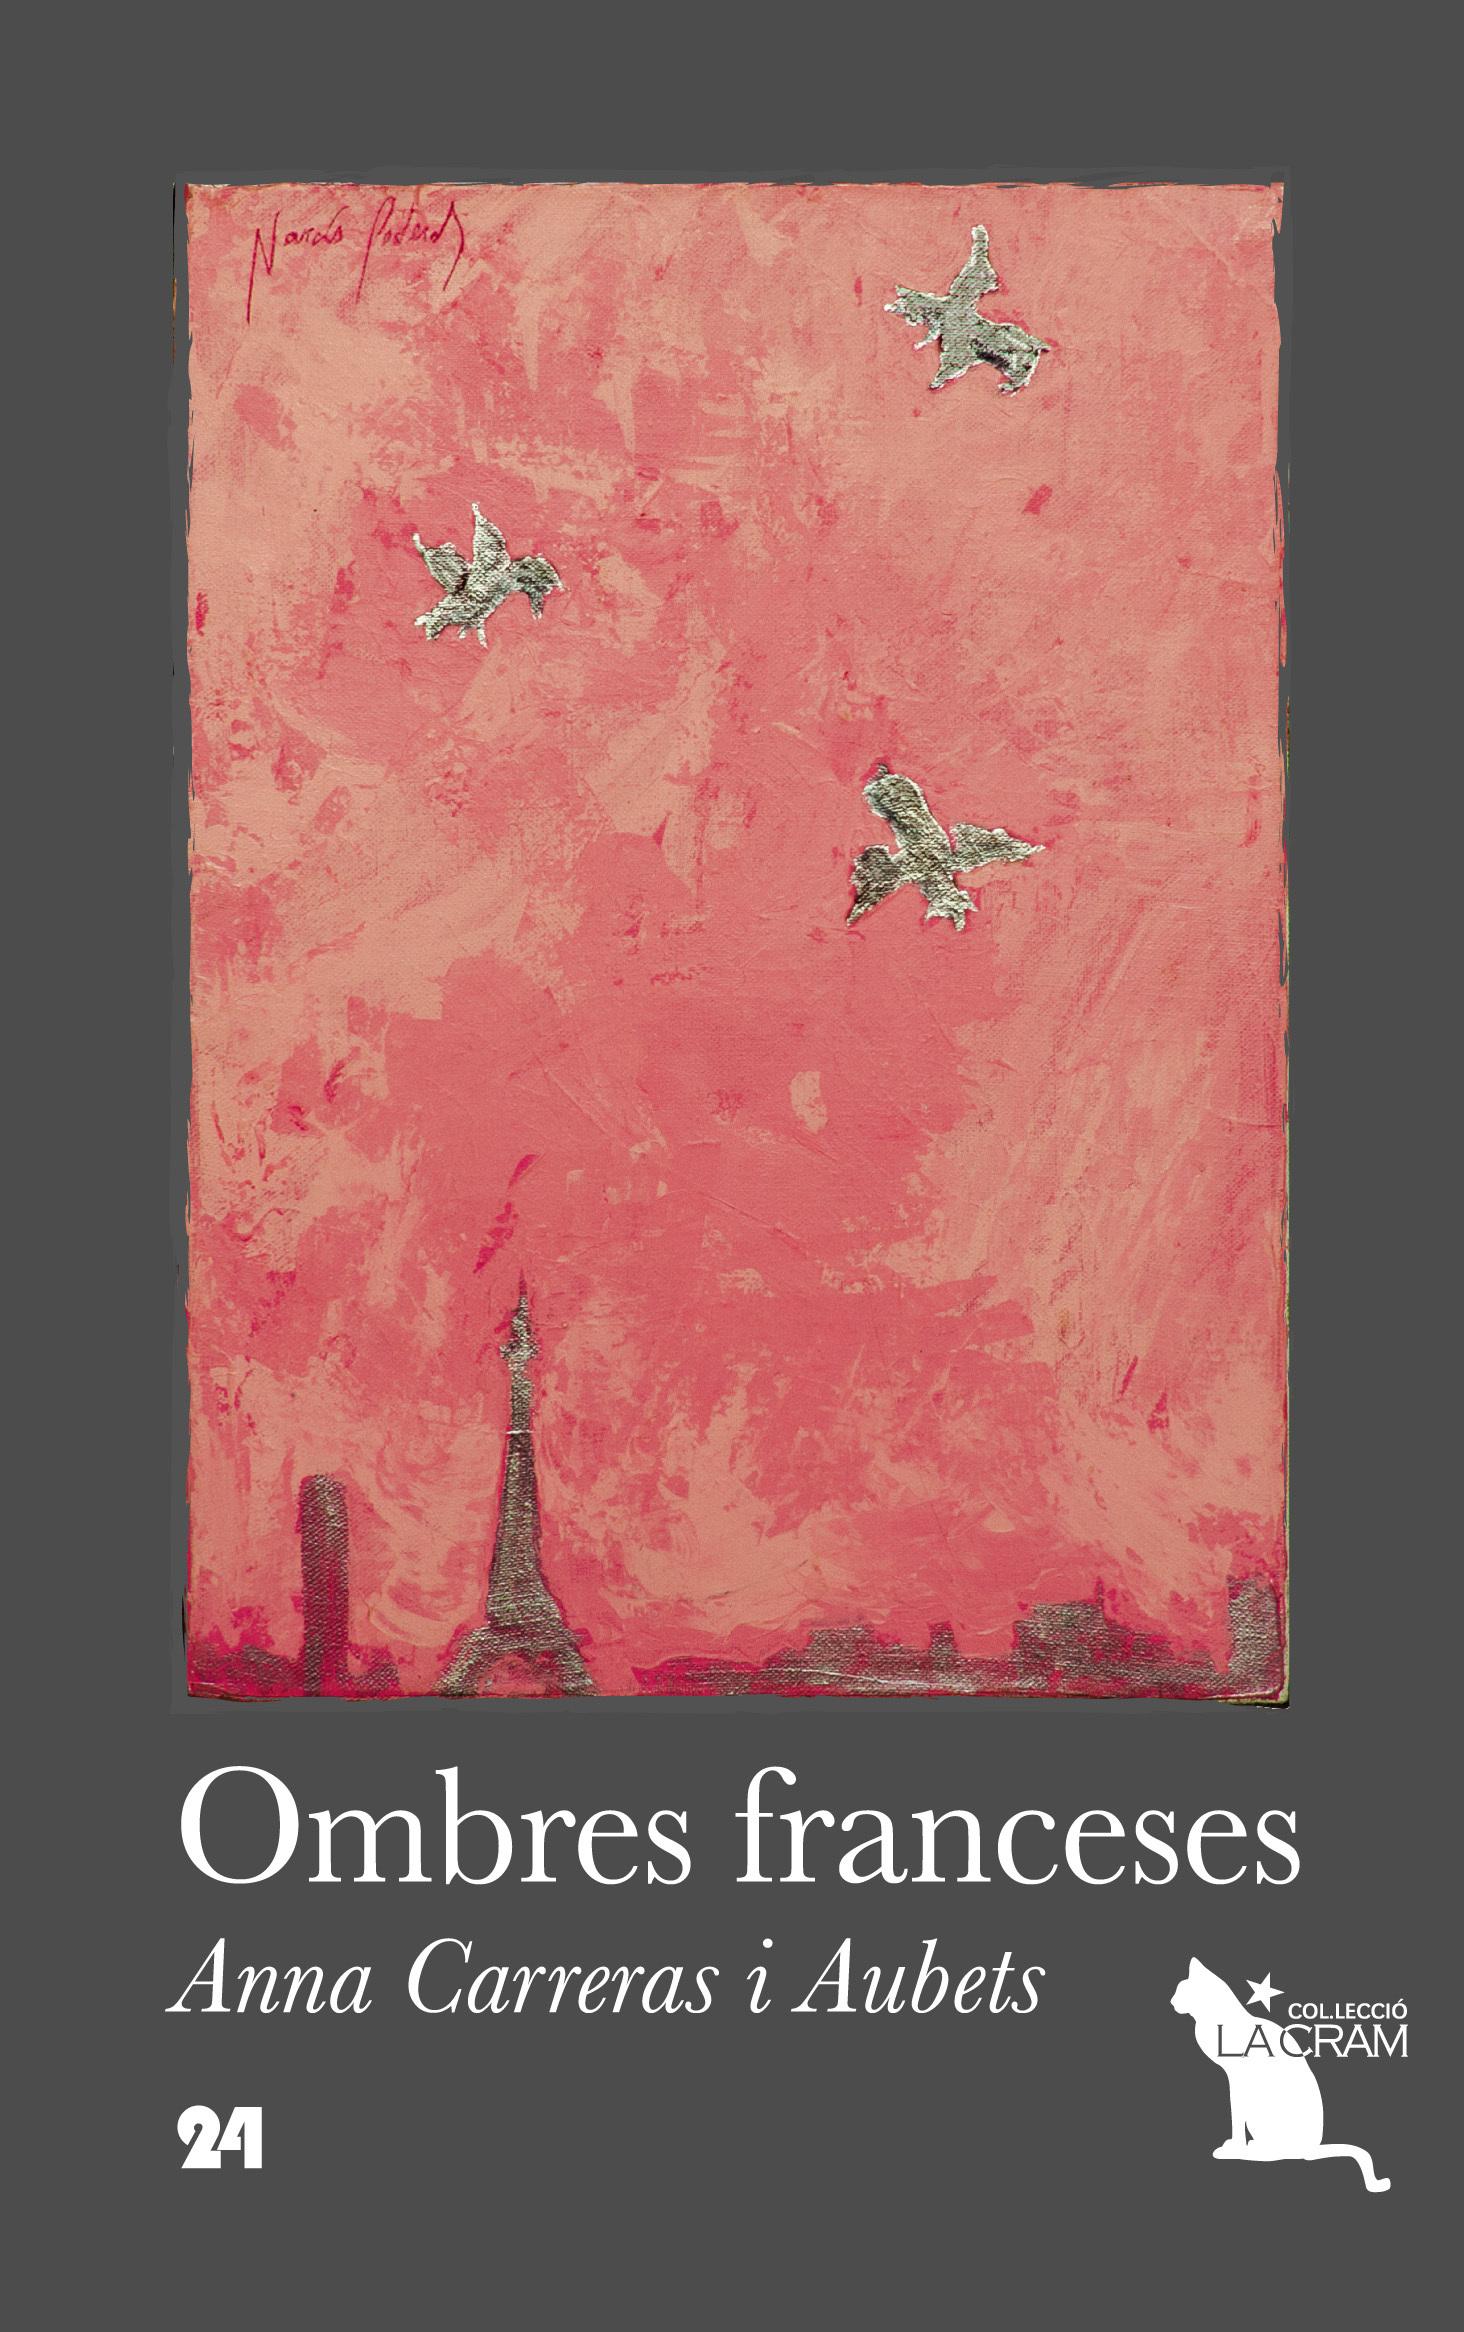 Ombres franceses, Anna Carreras